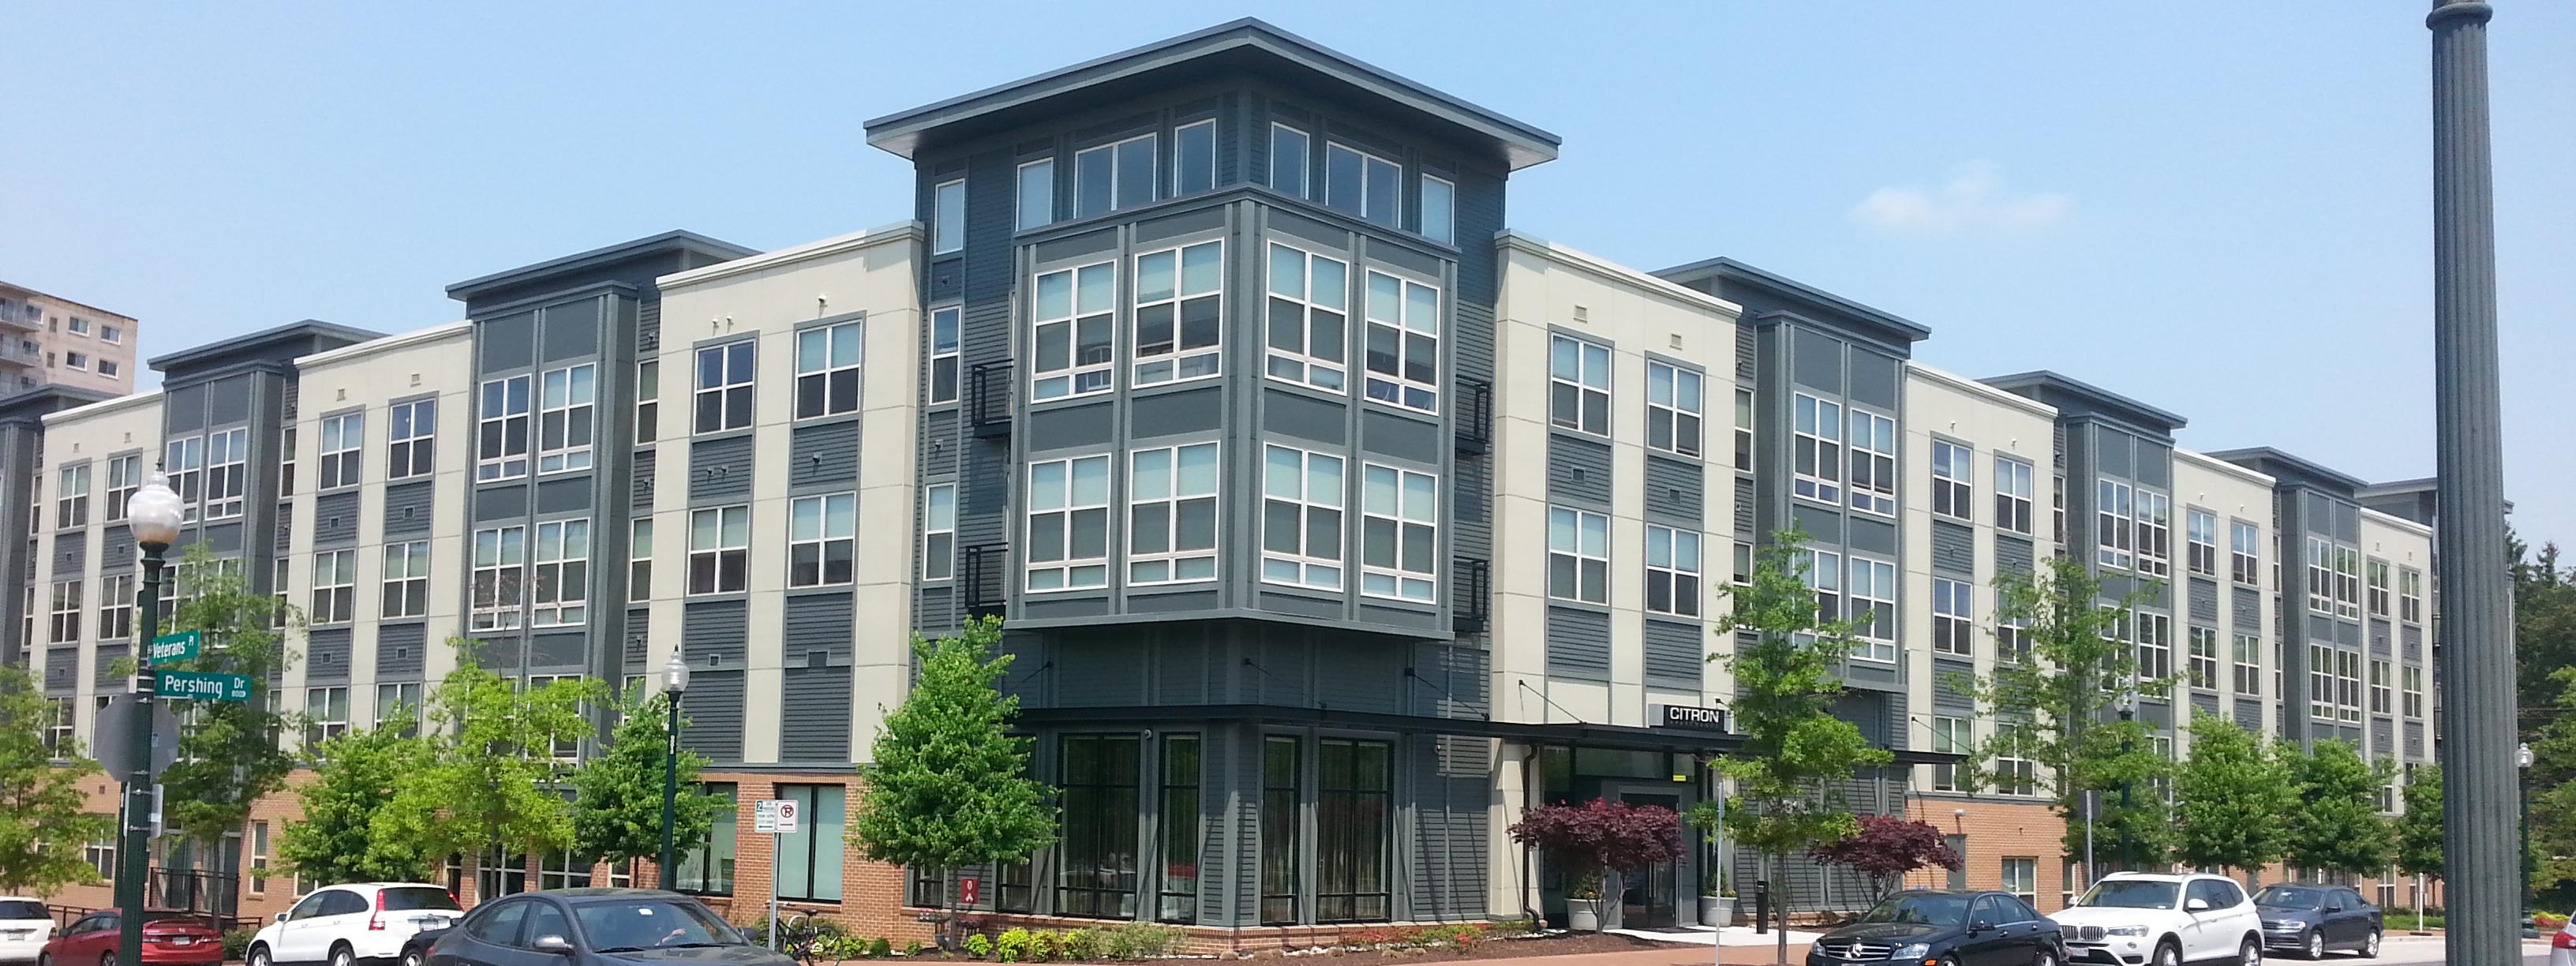 Housing - Montgomery Planning